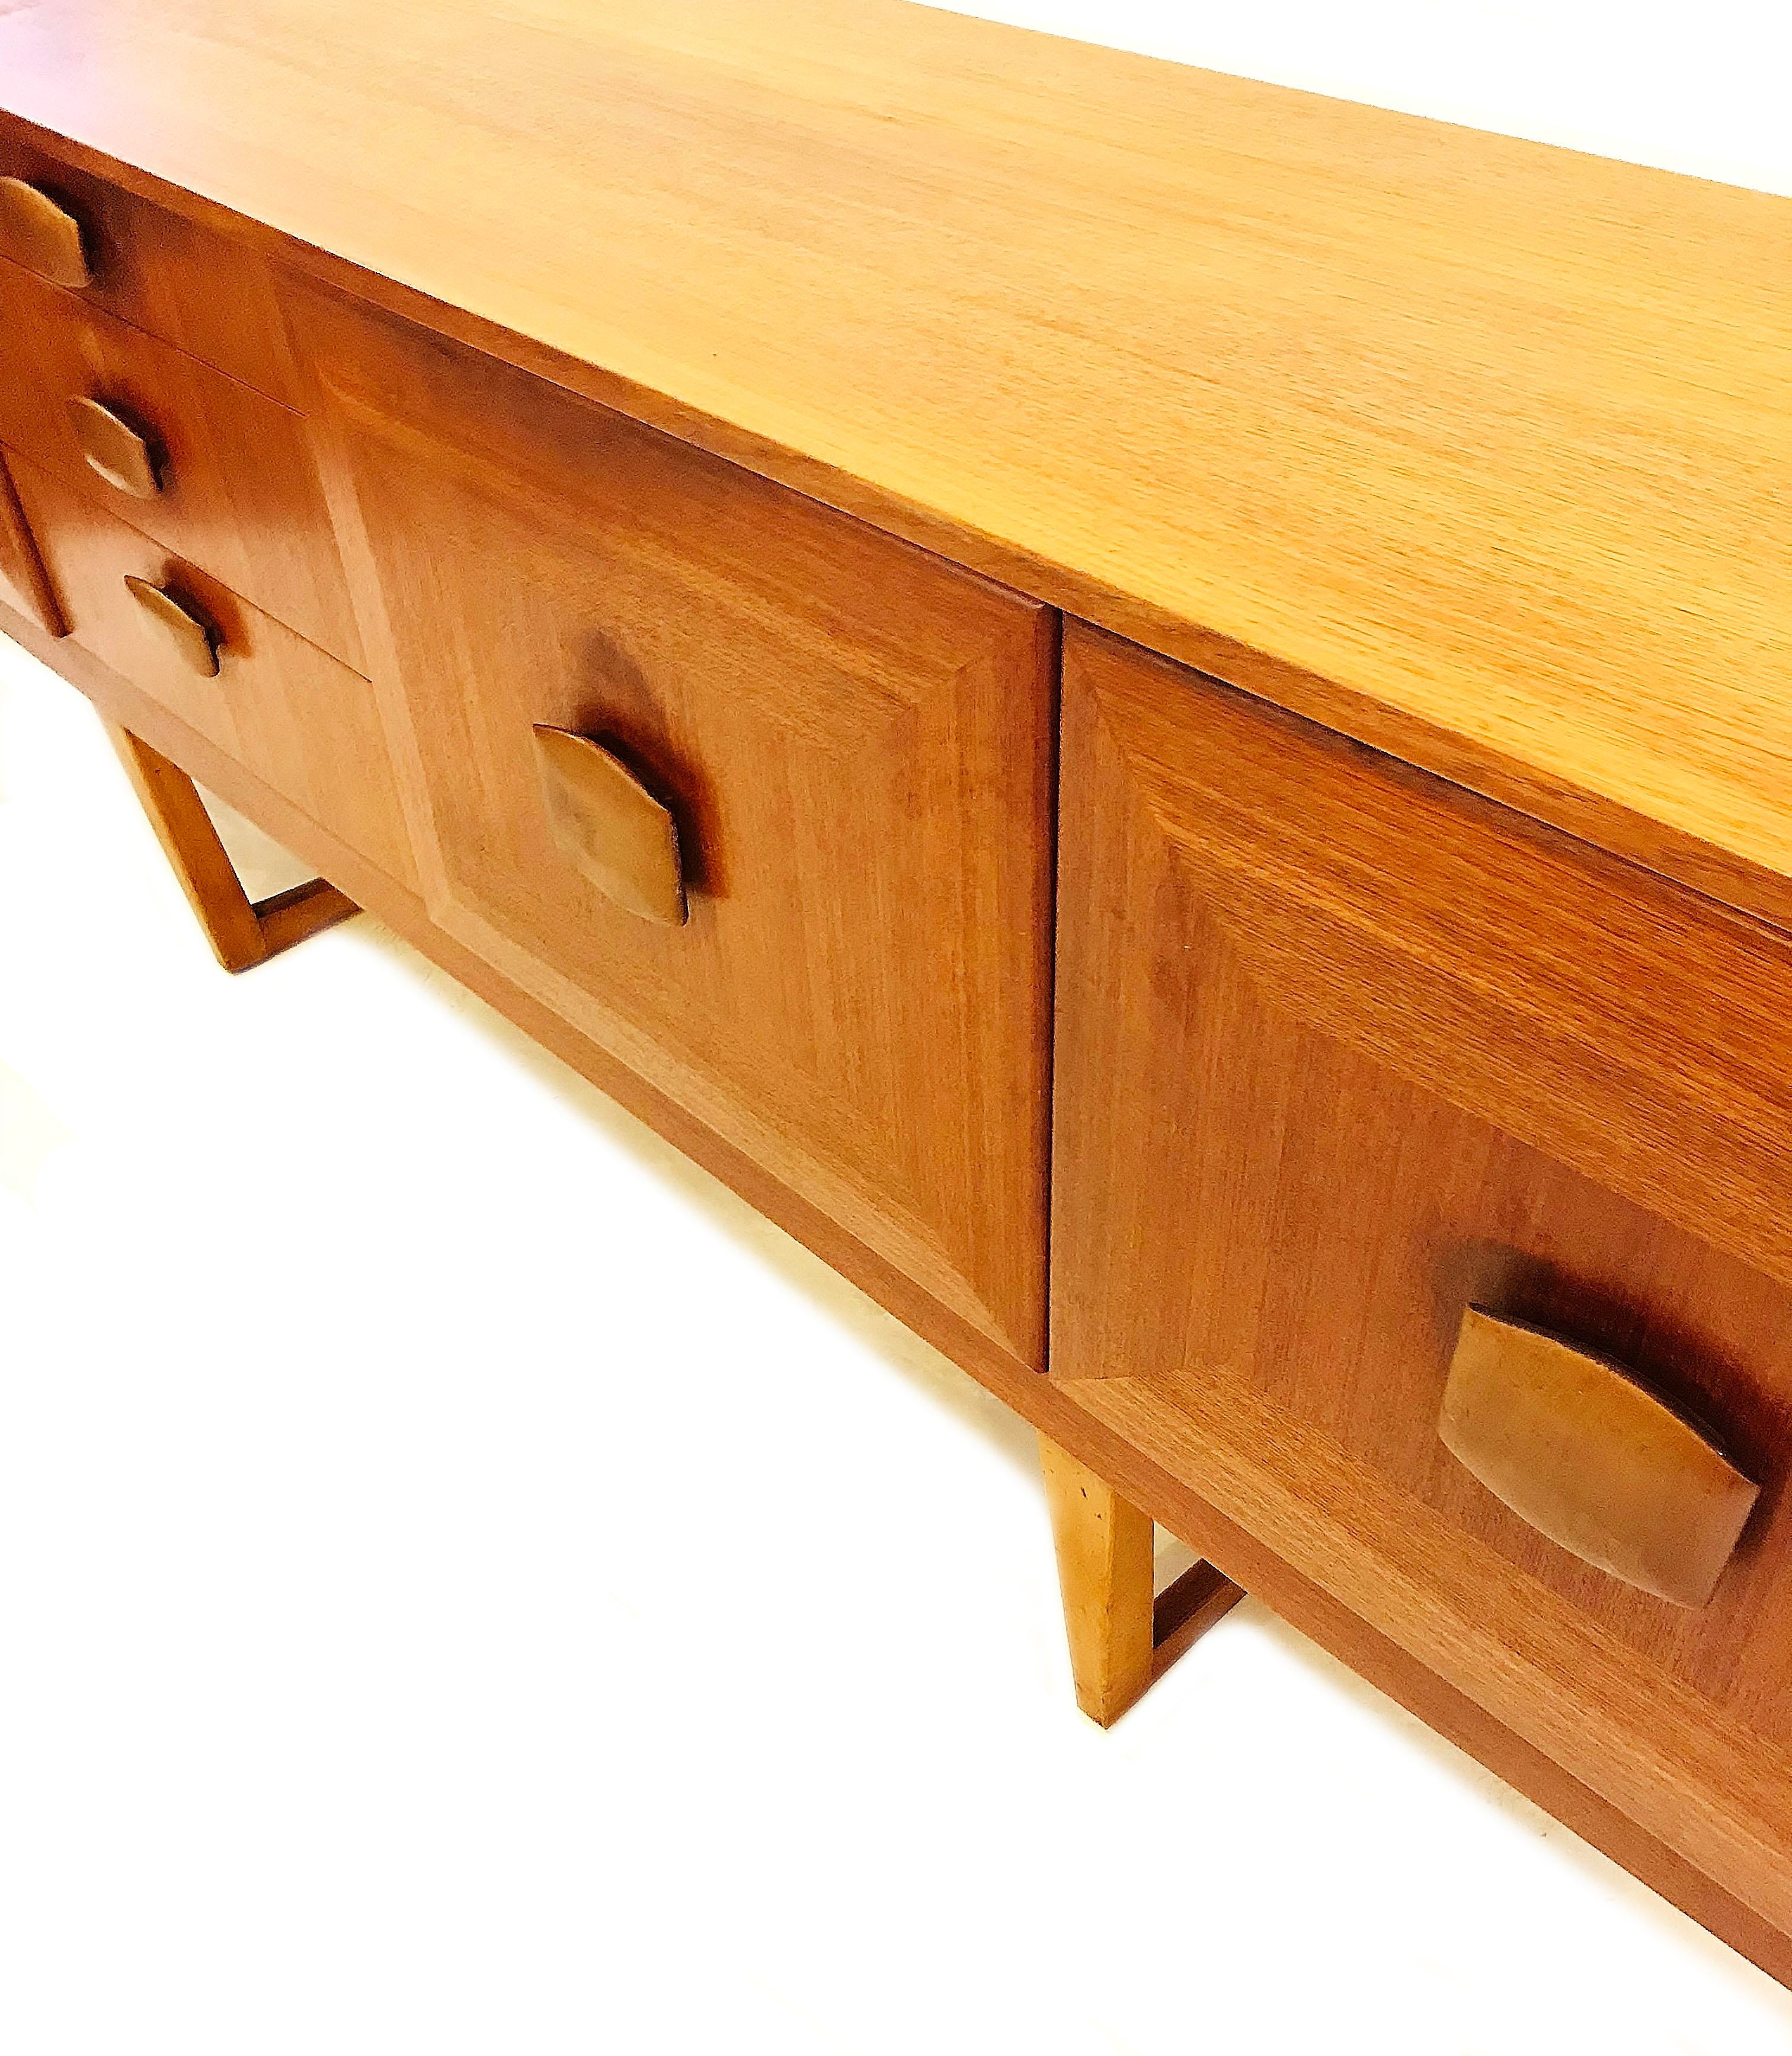 Danish Modern Vintage Stonehill Furniture English Modern Teak Credenza For  Sale   Image 3 Of 4